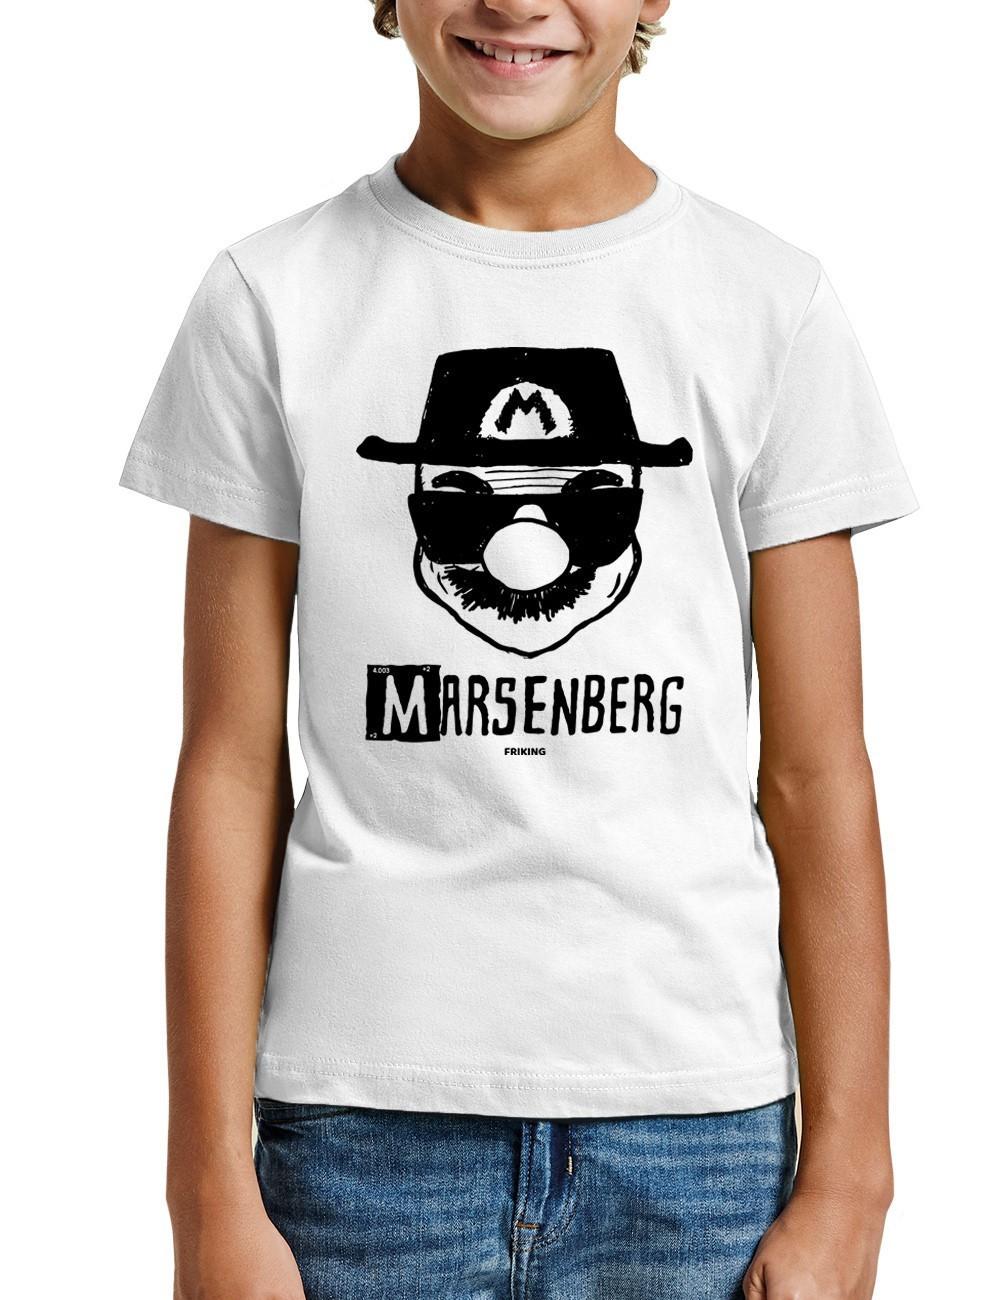 Marsenberg